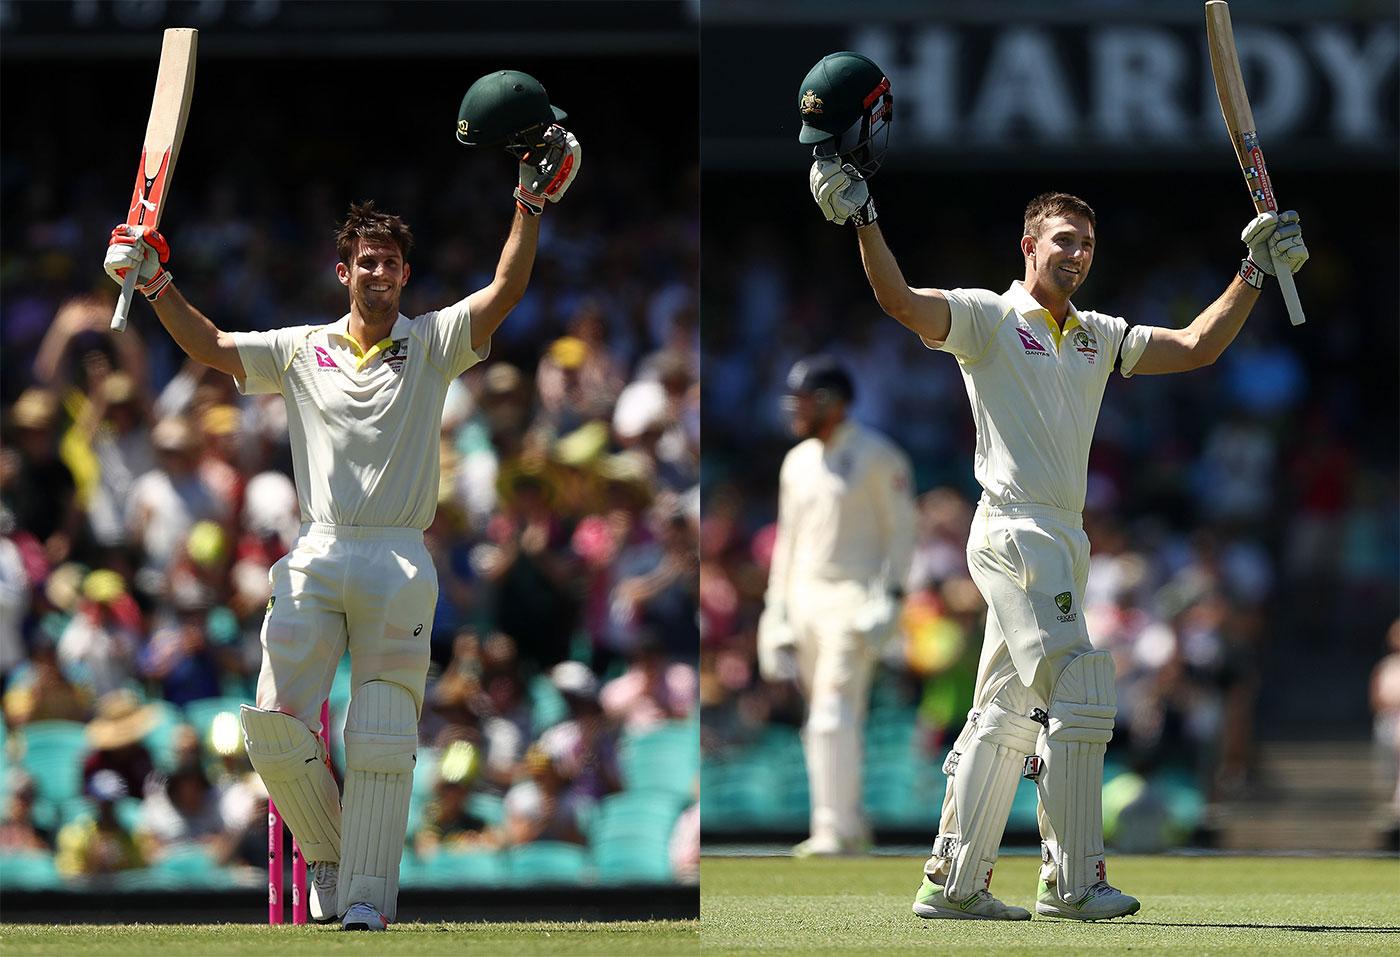 Australia vs England 5th Test Day 4 Highlights